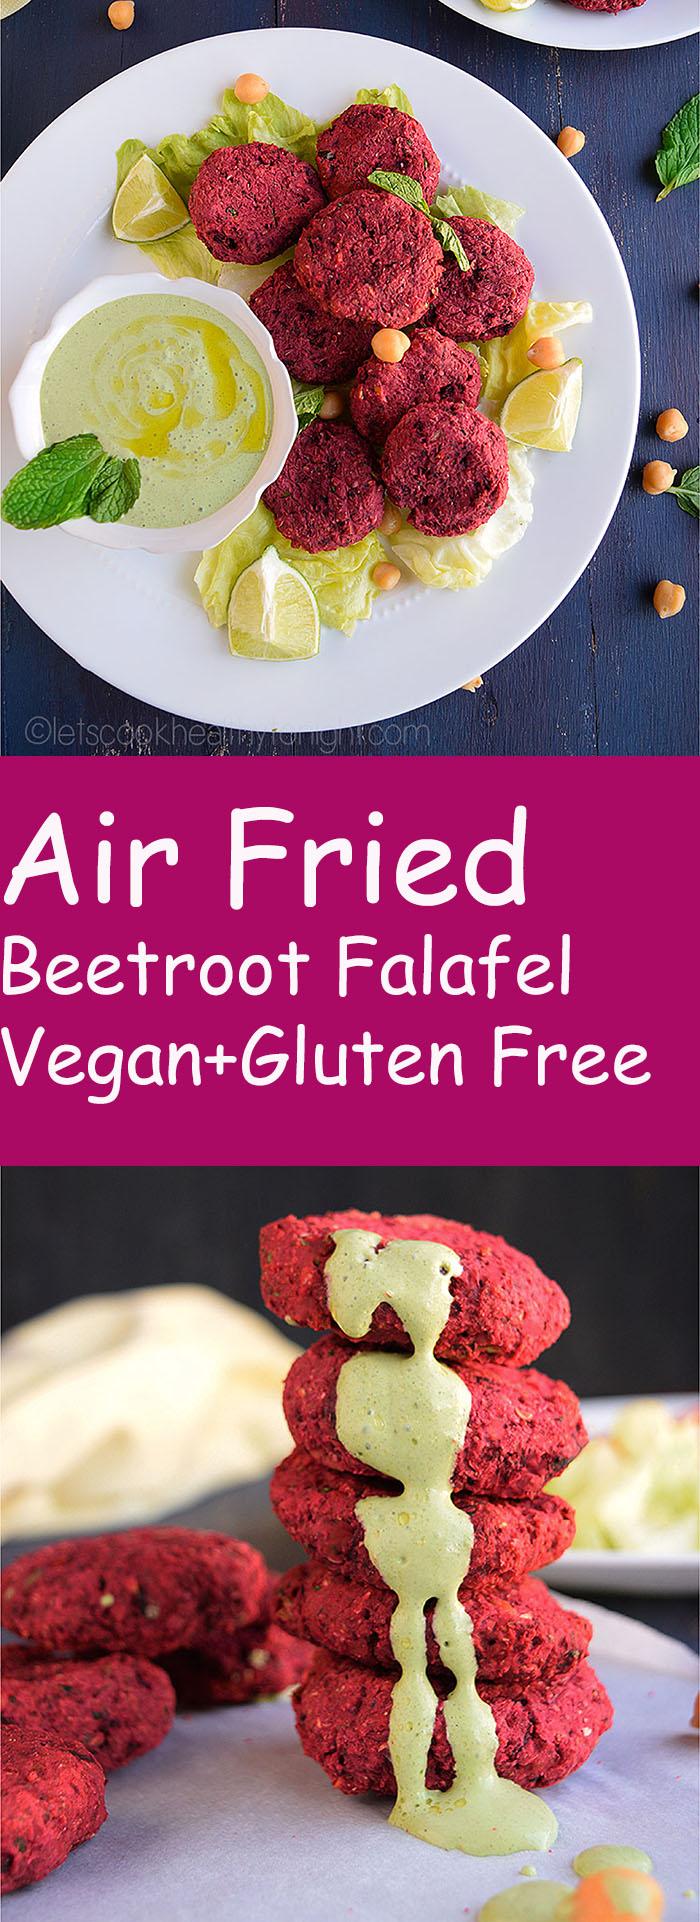 Air Fried Beetroot Falafel